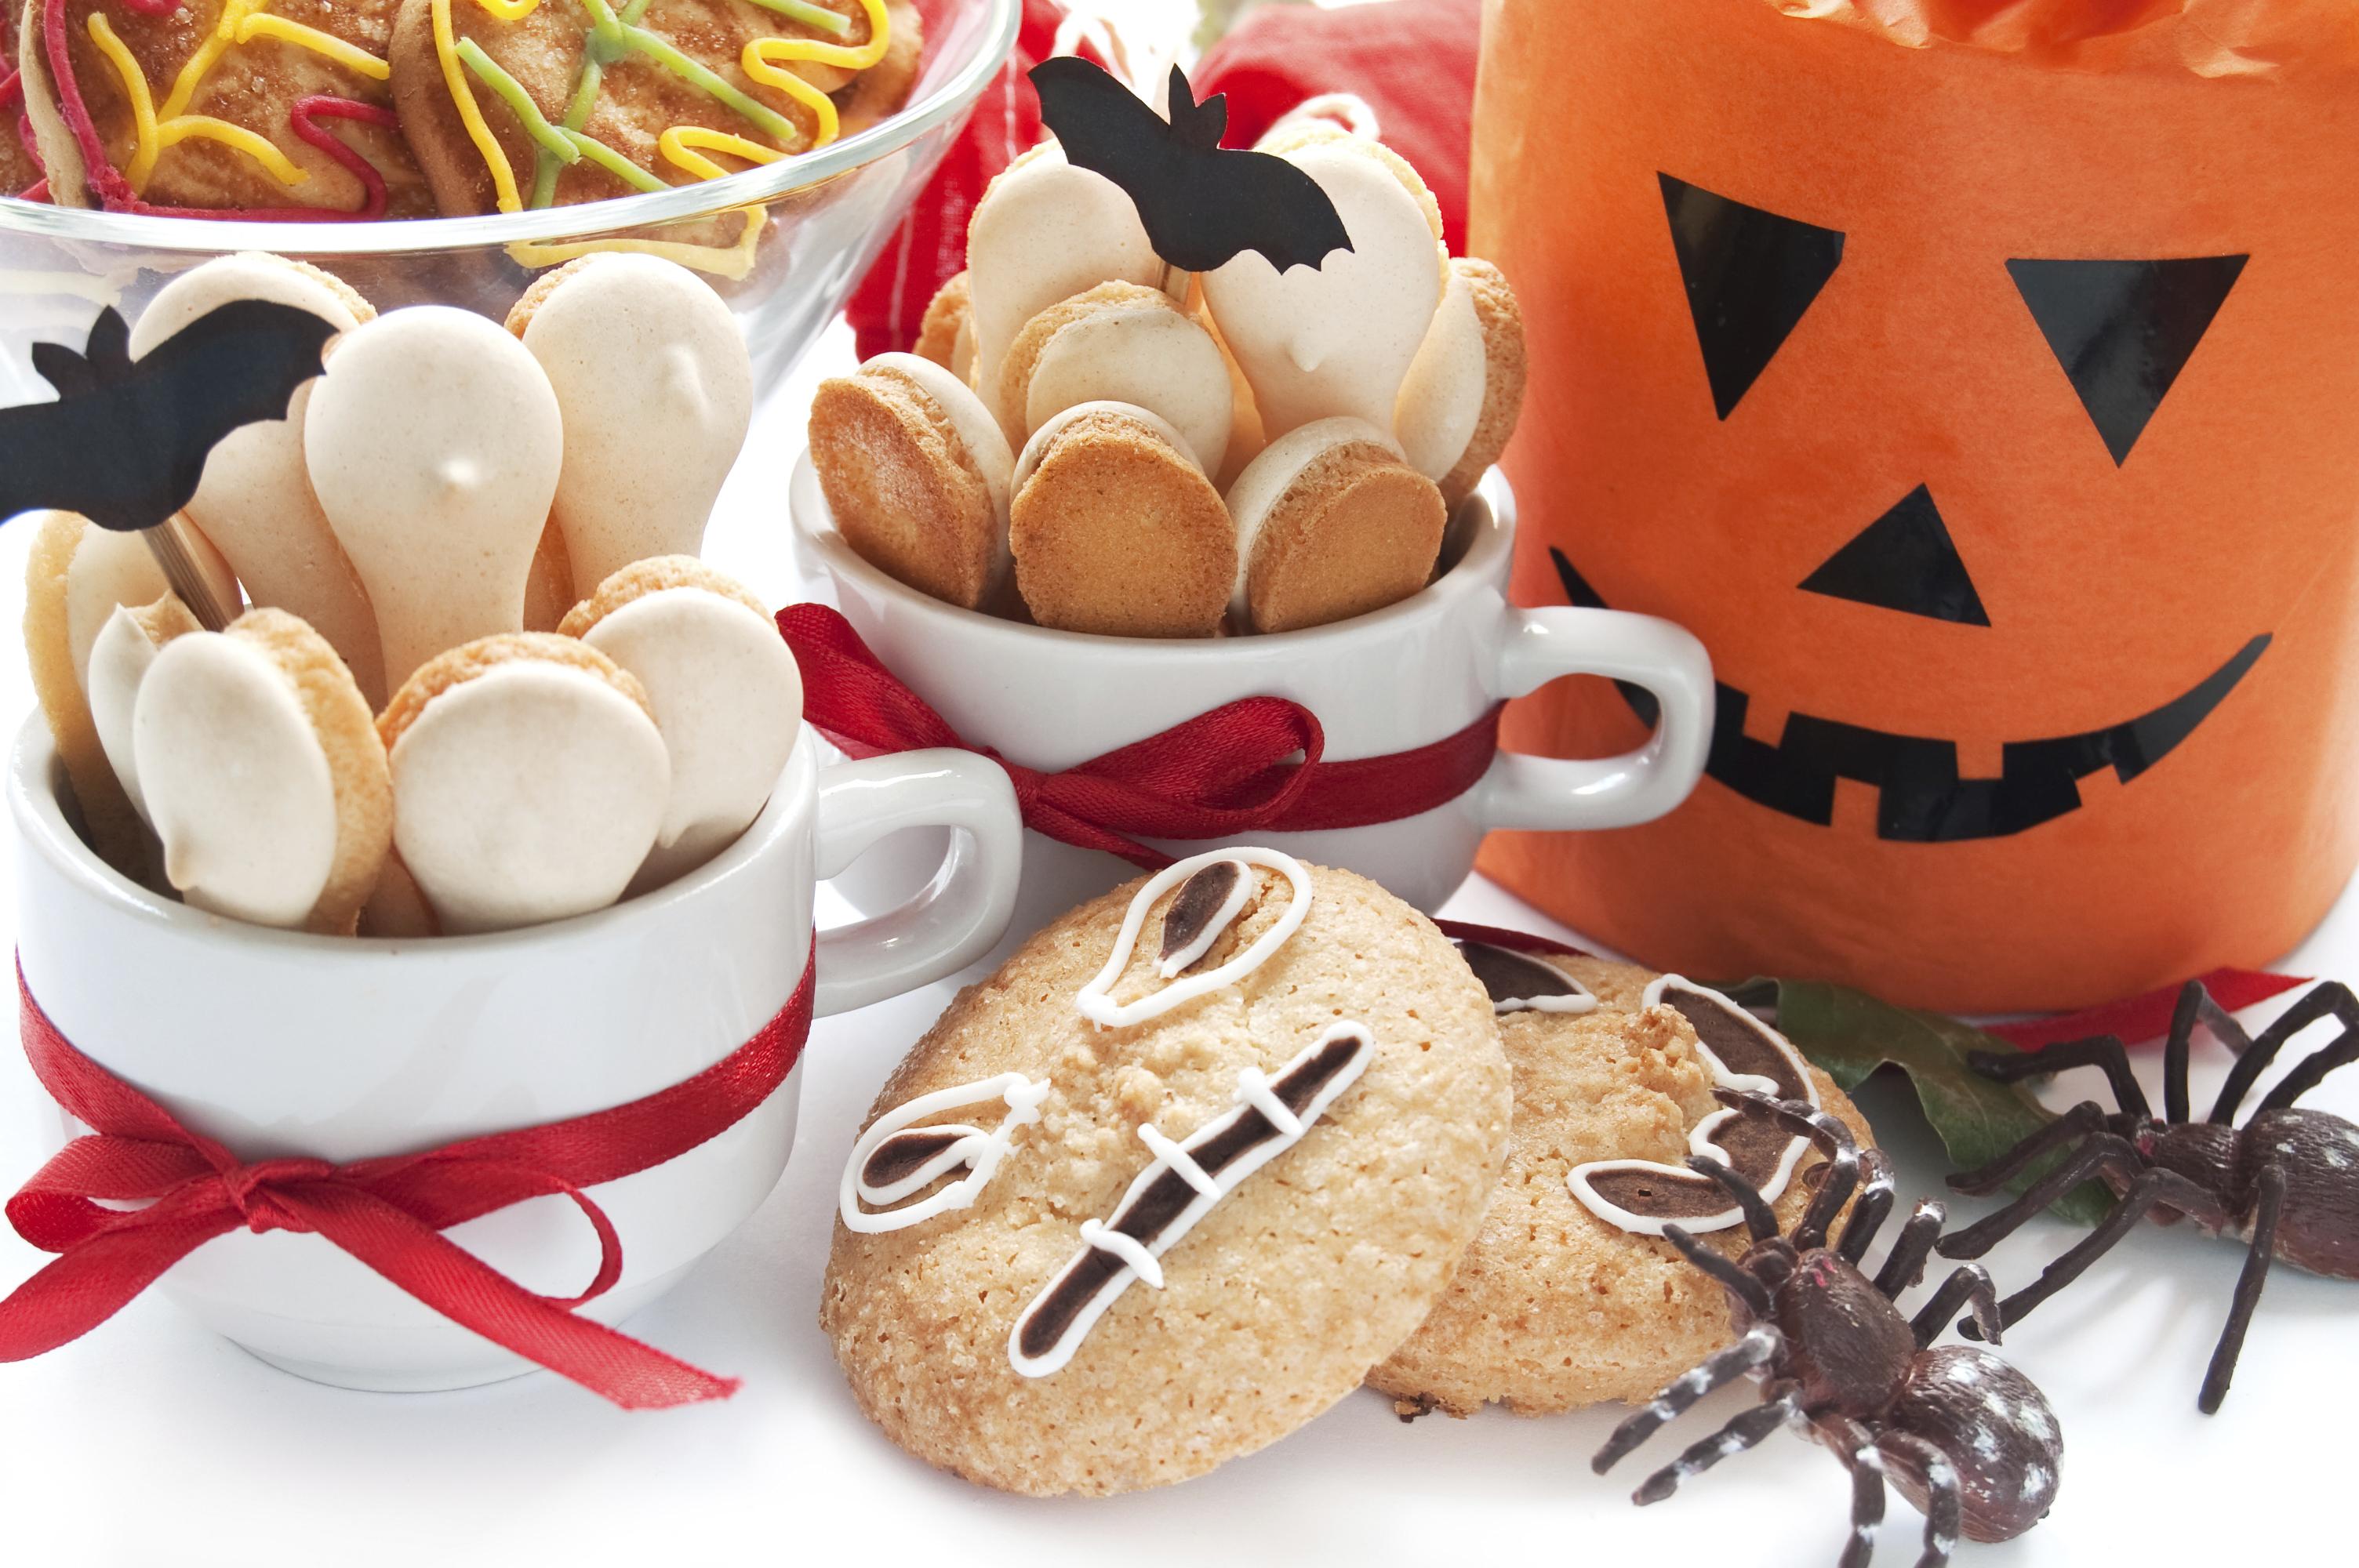 Dolci Halloween.Dolci Senza Uova Per Halloween Food Blog